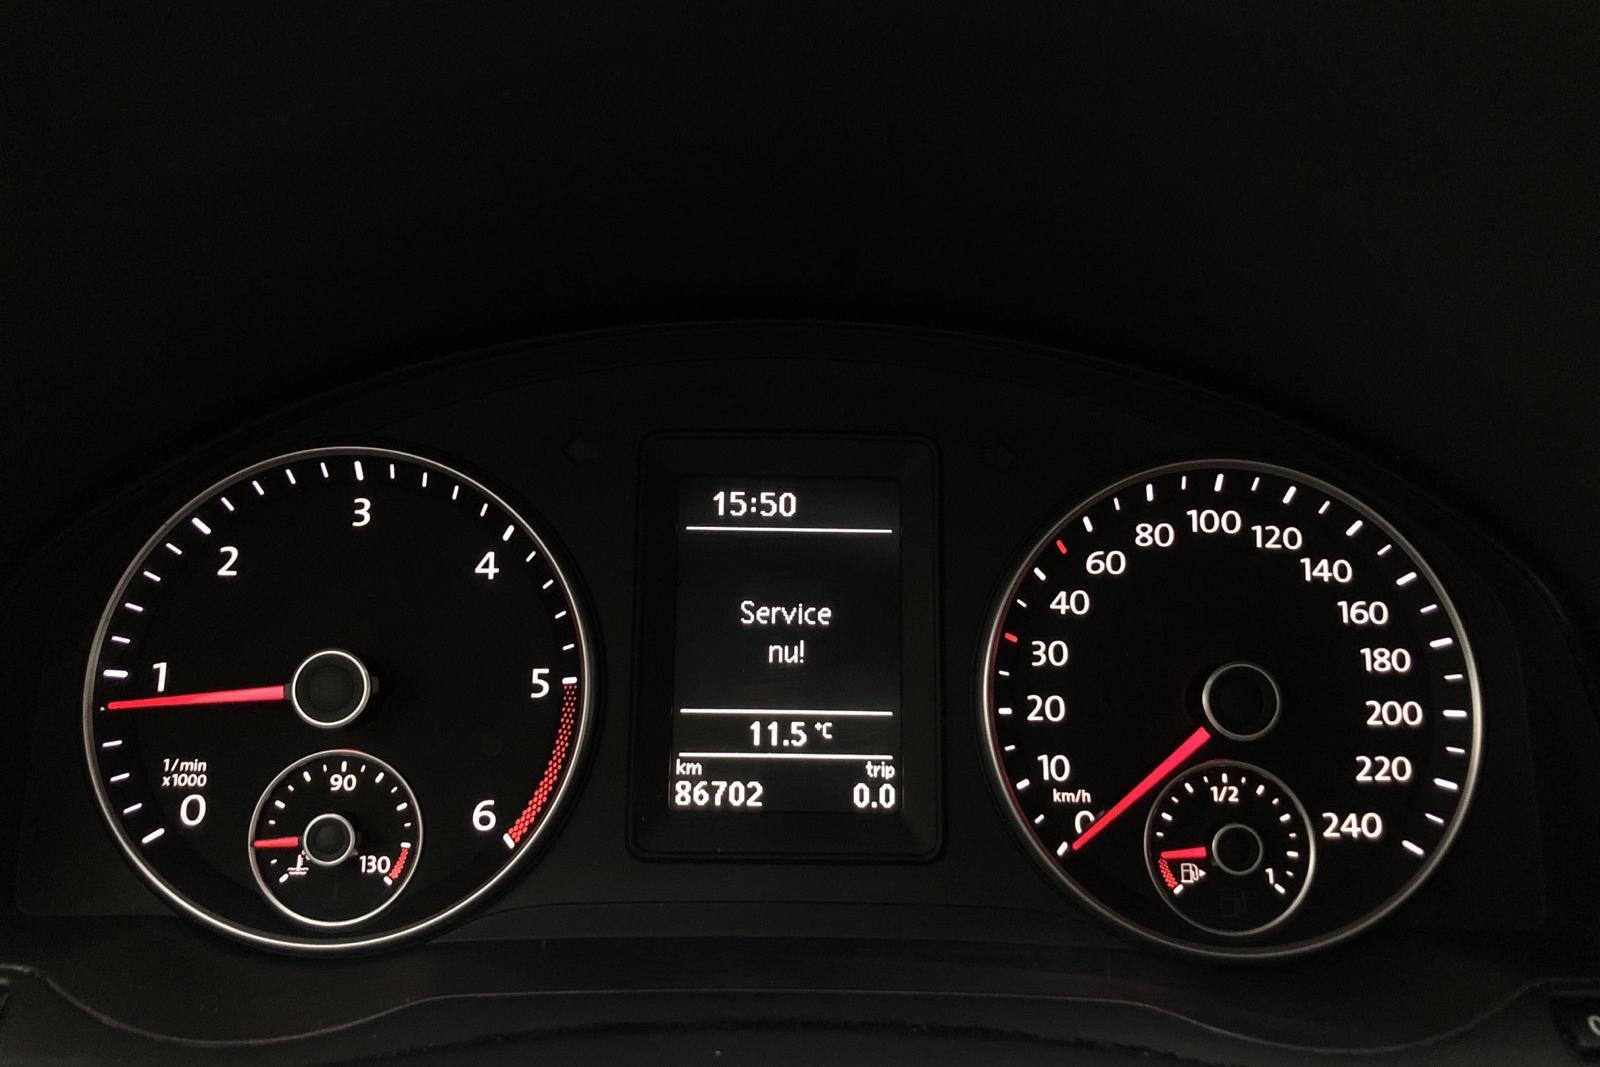 VW Golf VI 1.6 TDI BlueMotion Technology Plus (105hk) - 8 587 mil - Manuell - svart - 2012